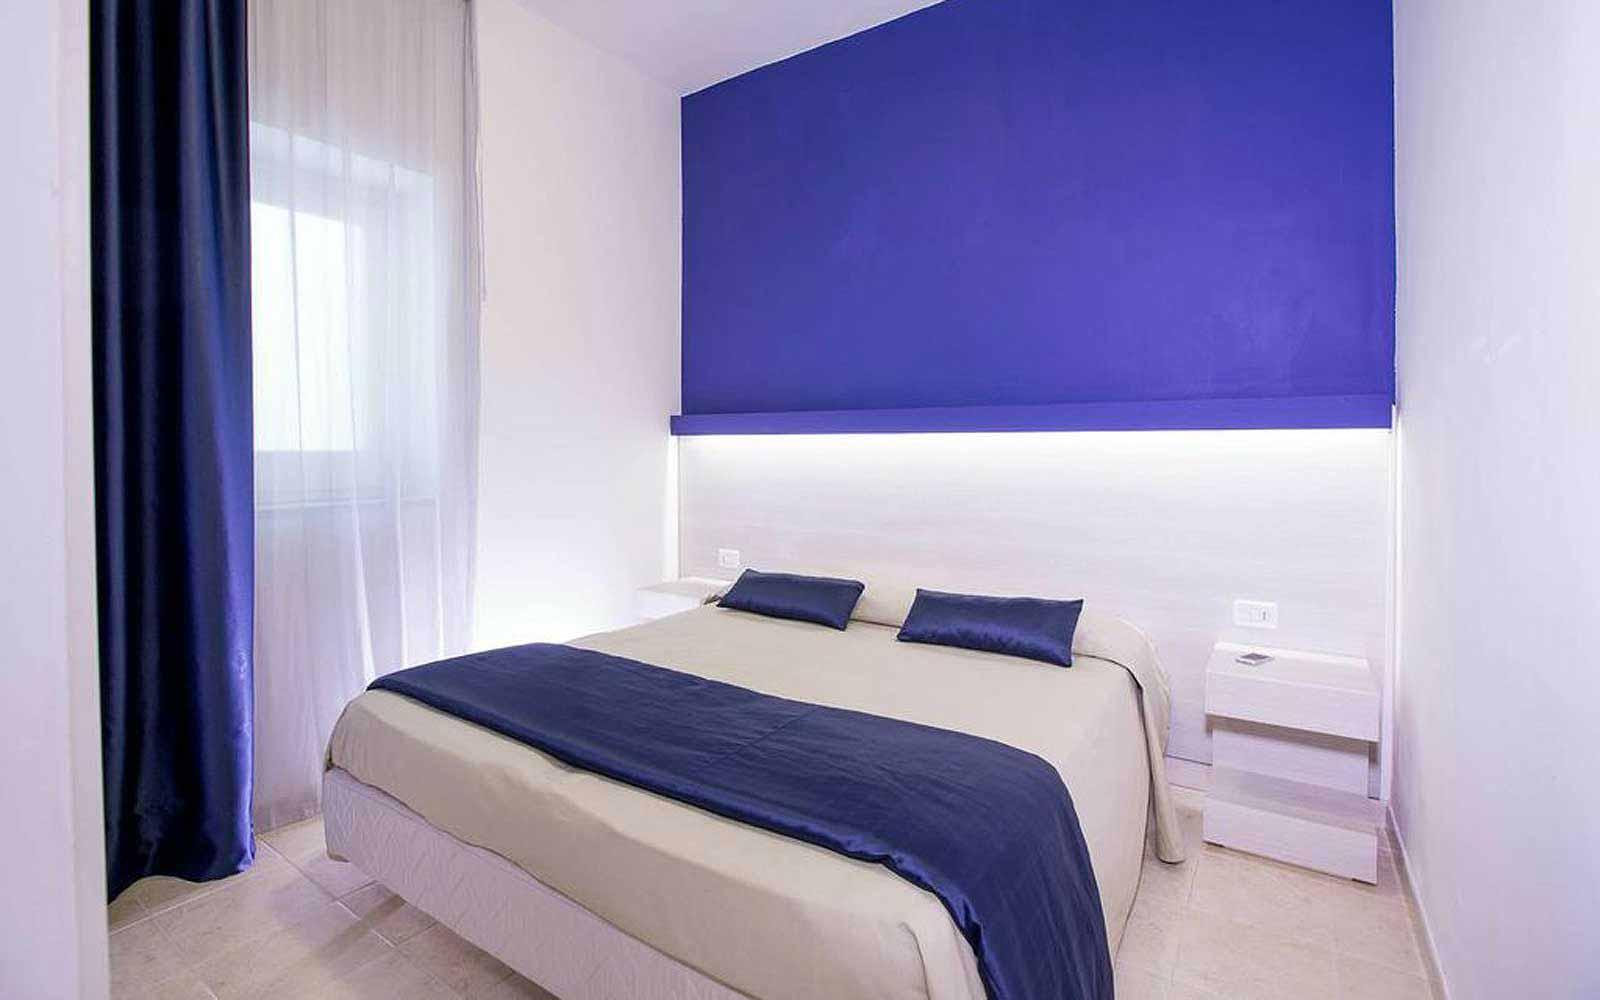 Family deluxe room at the Gattarella Resort